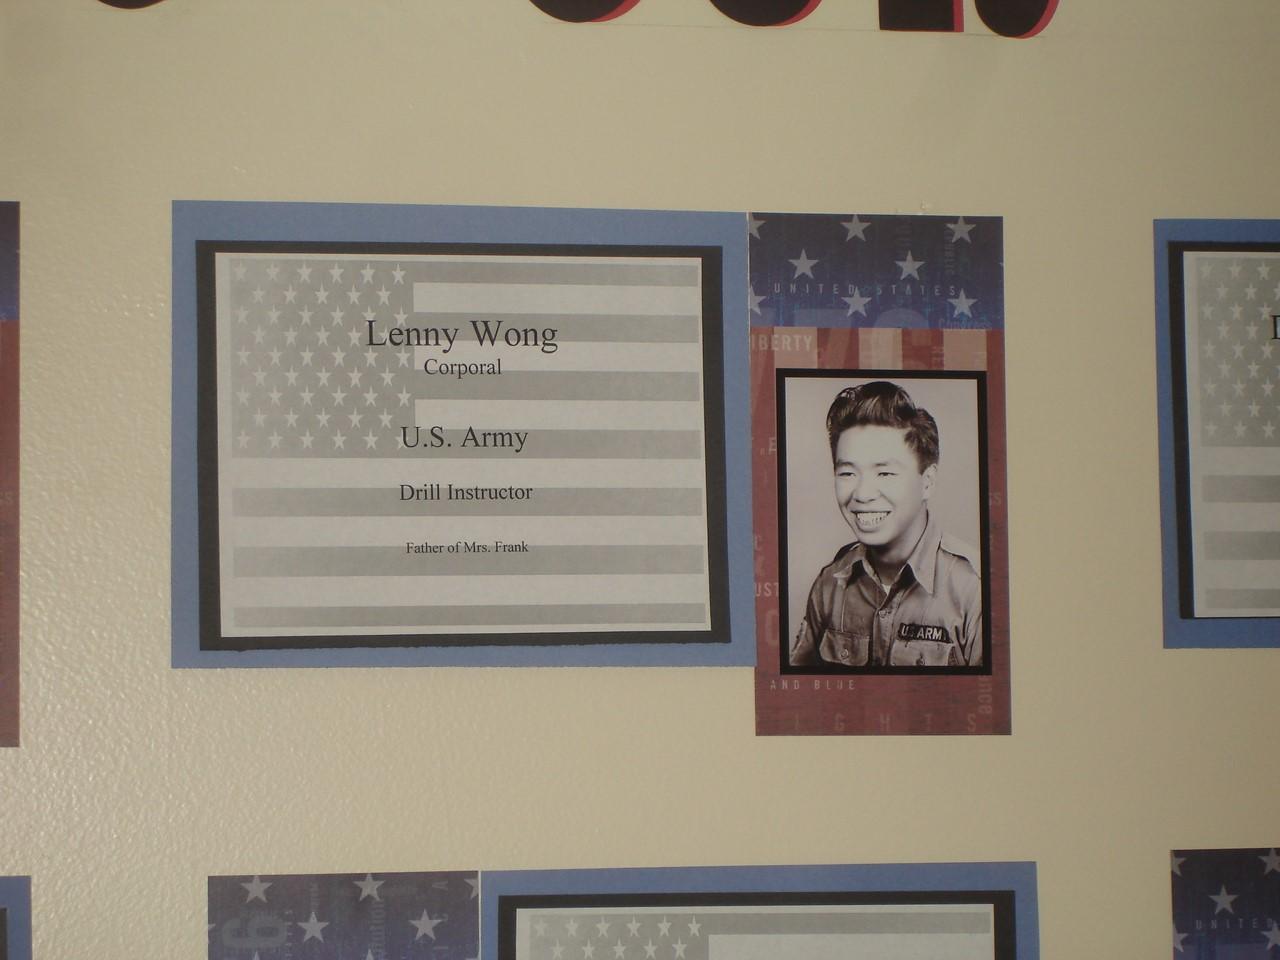 Veteran's Day 2007